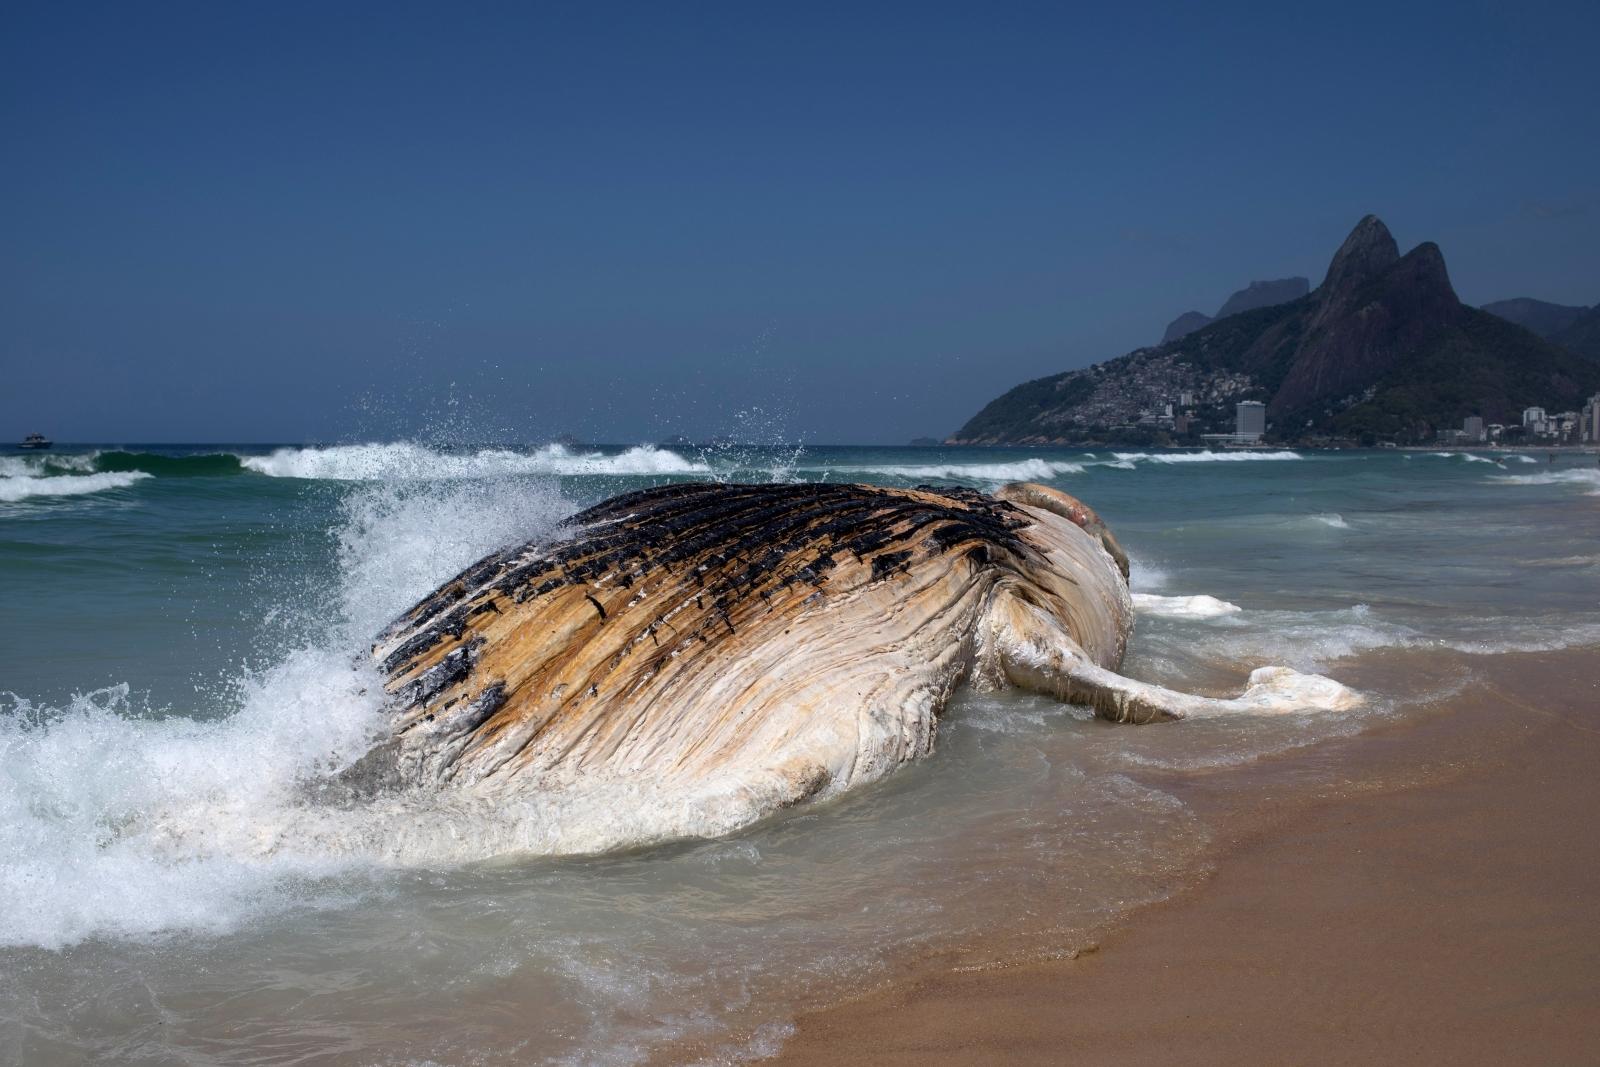 30-ton humpback whale